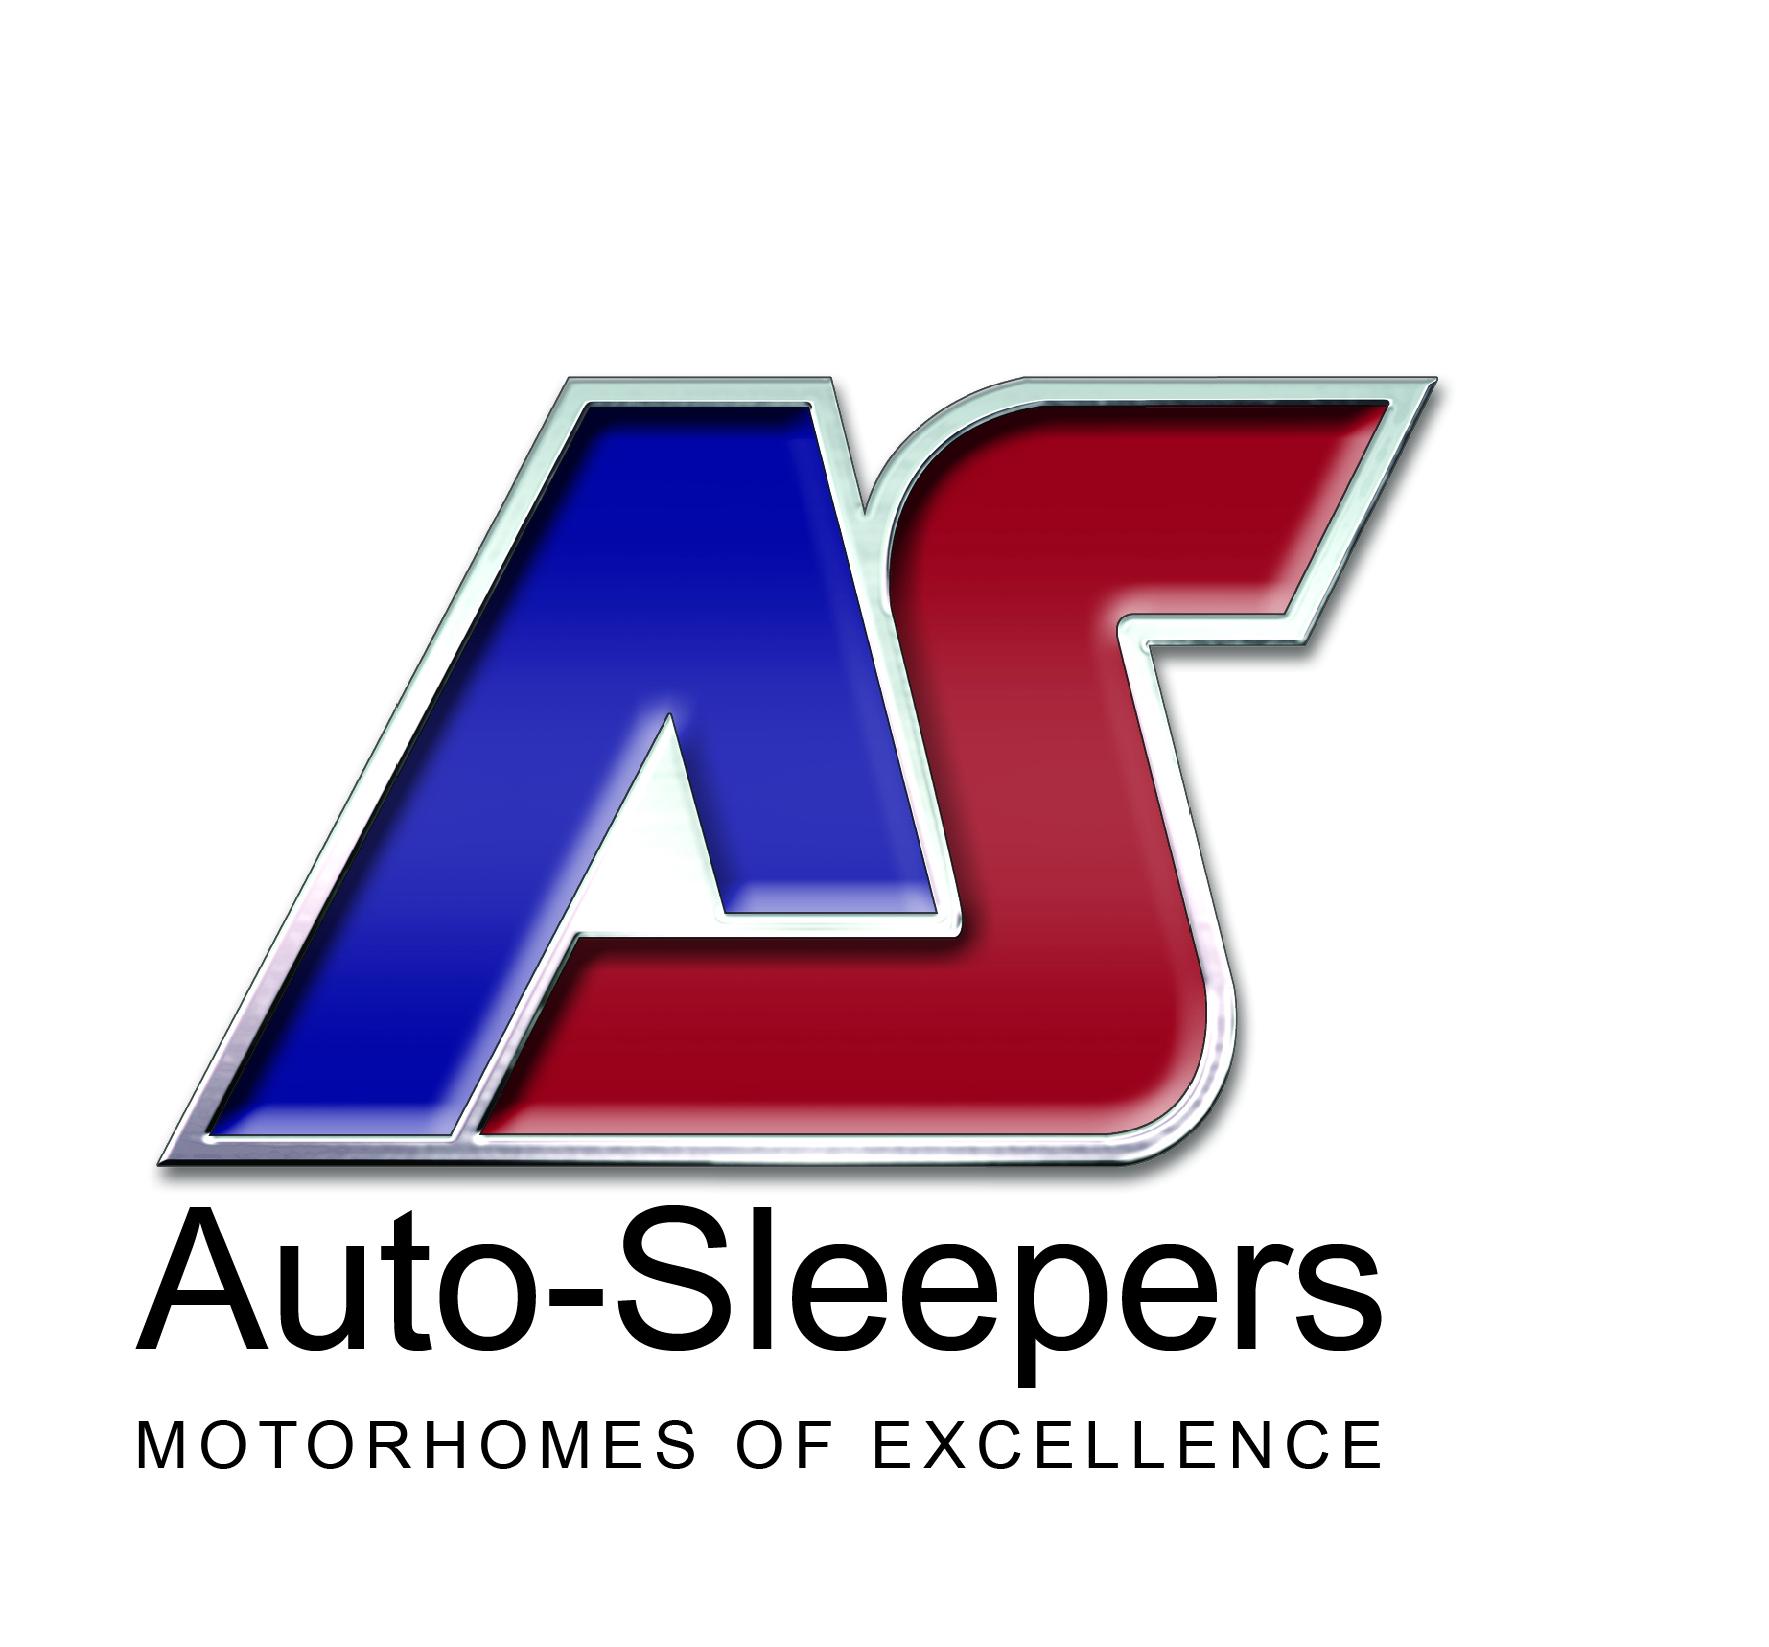 Island Auto Group >> New Motorhomes   2017 Models   Auto-Sleepers